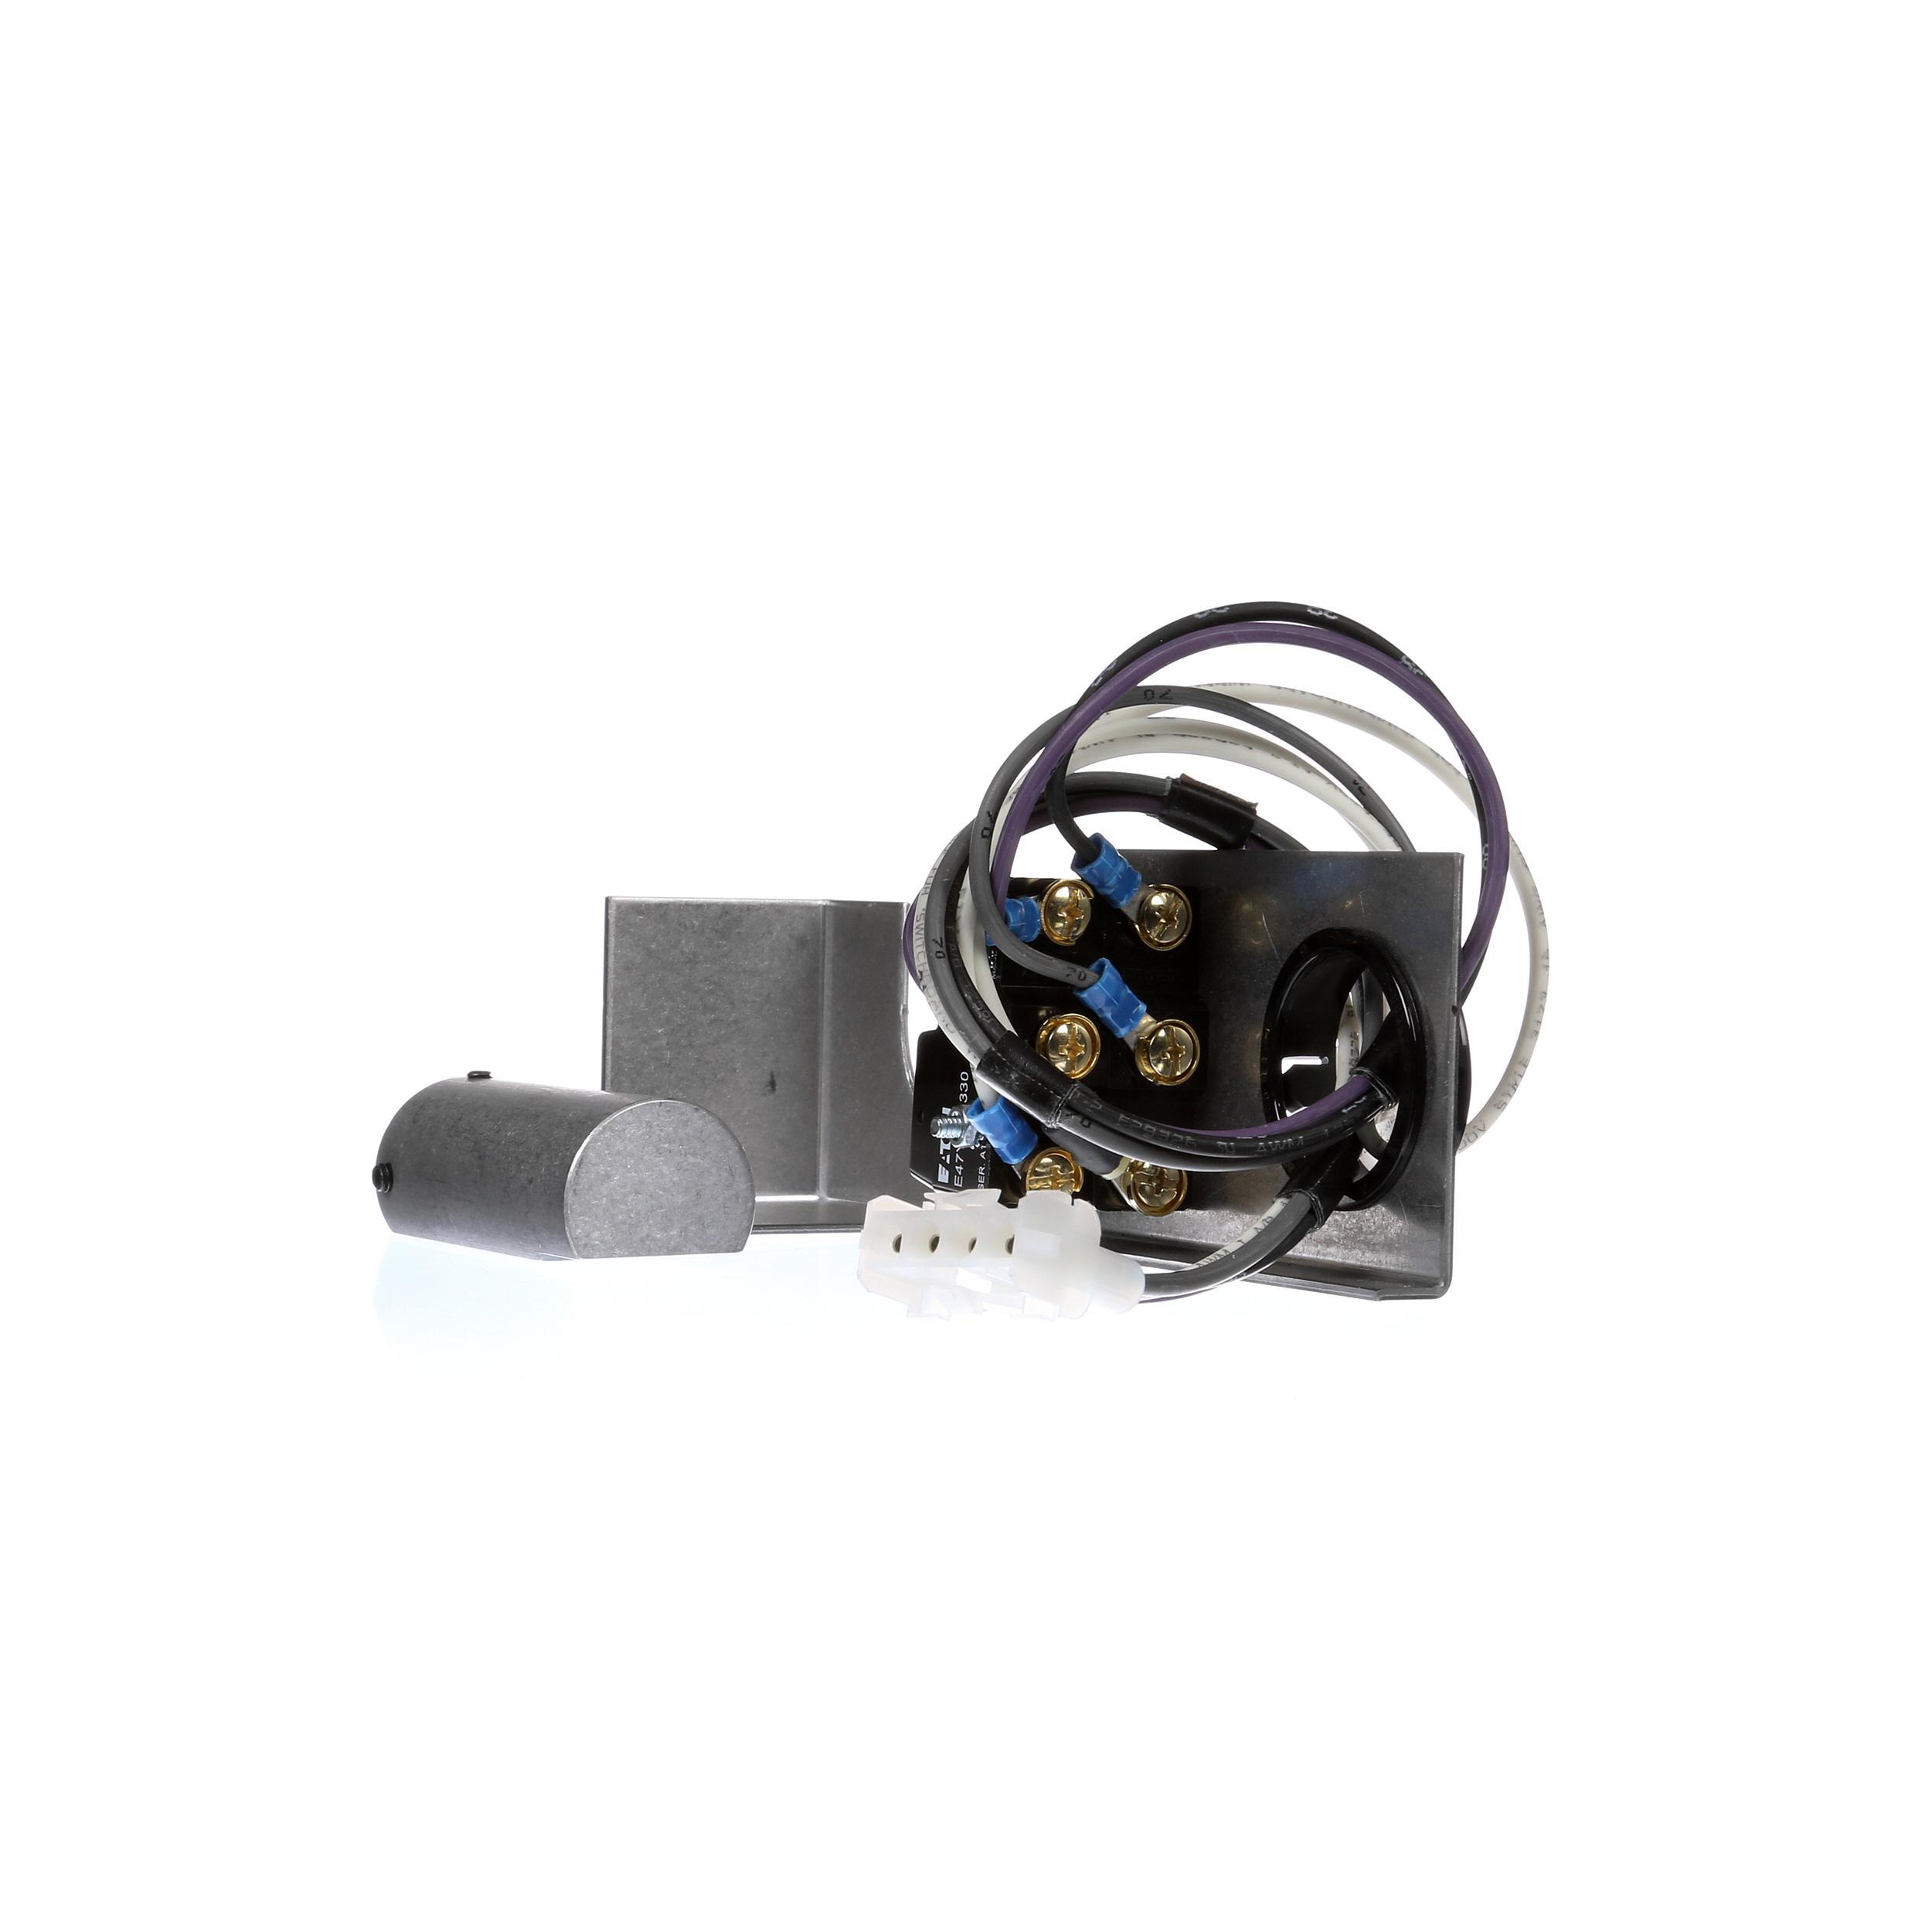 garland kit door switch mech control mco part 115346. Black Bedroom Furniture Sets. Home Design Ideas